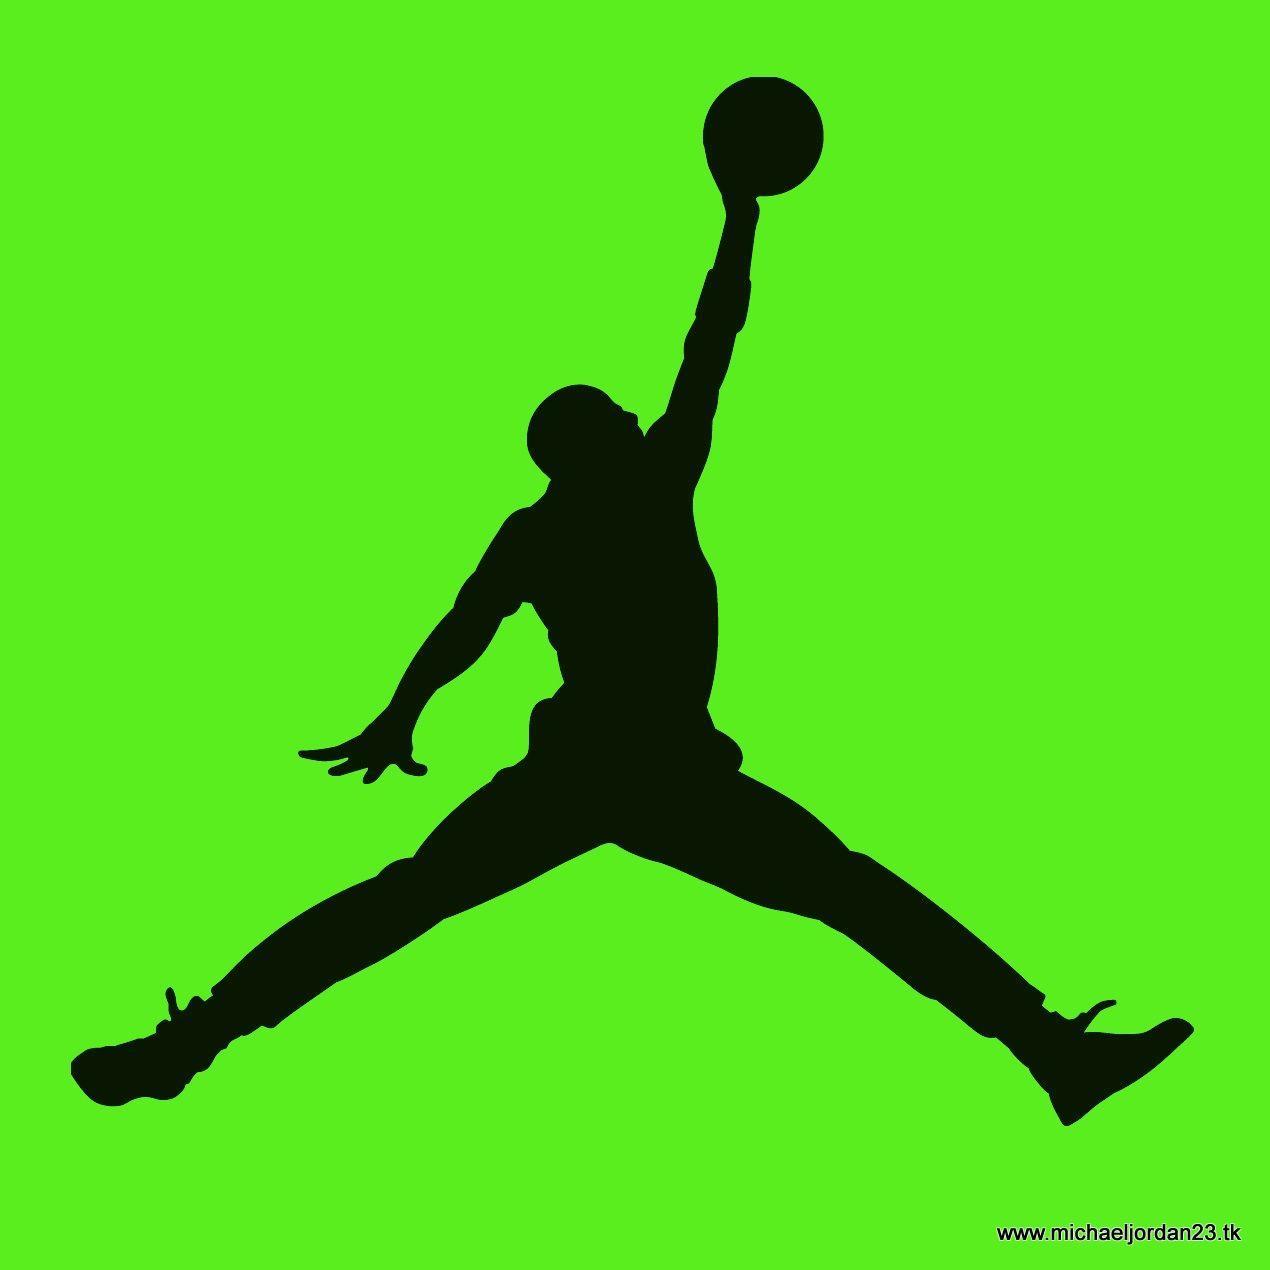 Oponerse a Modernizar Autocomplacencia  Jordan with Jordan 23 Logo - LogoDix